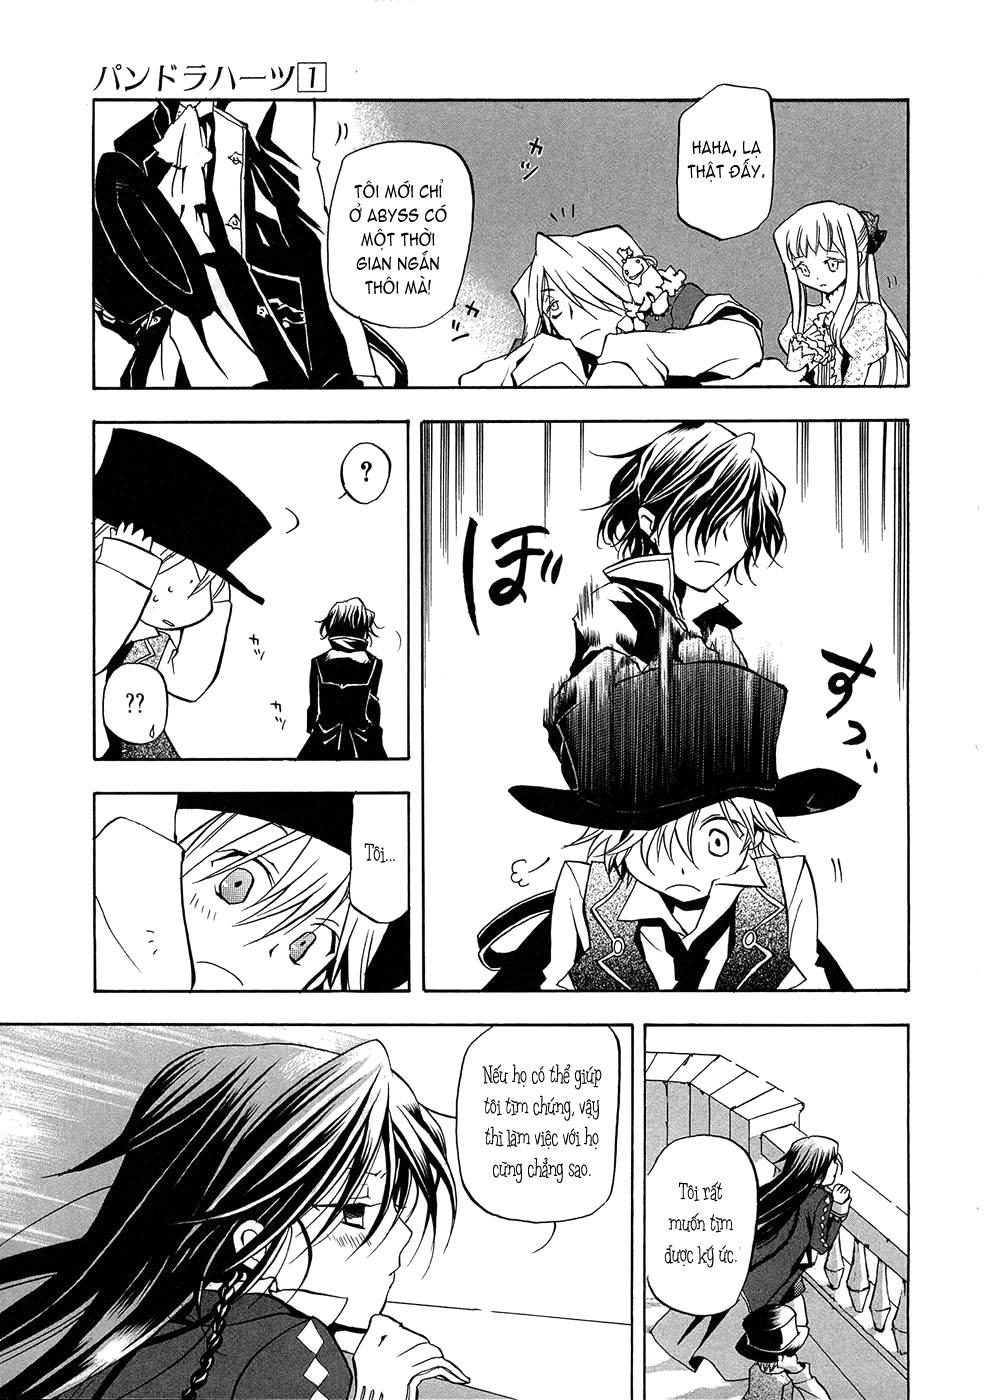 Pandora Hearts chương 004 - retrace: iv rendezvous trang 41